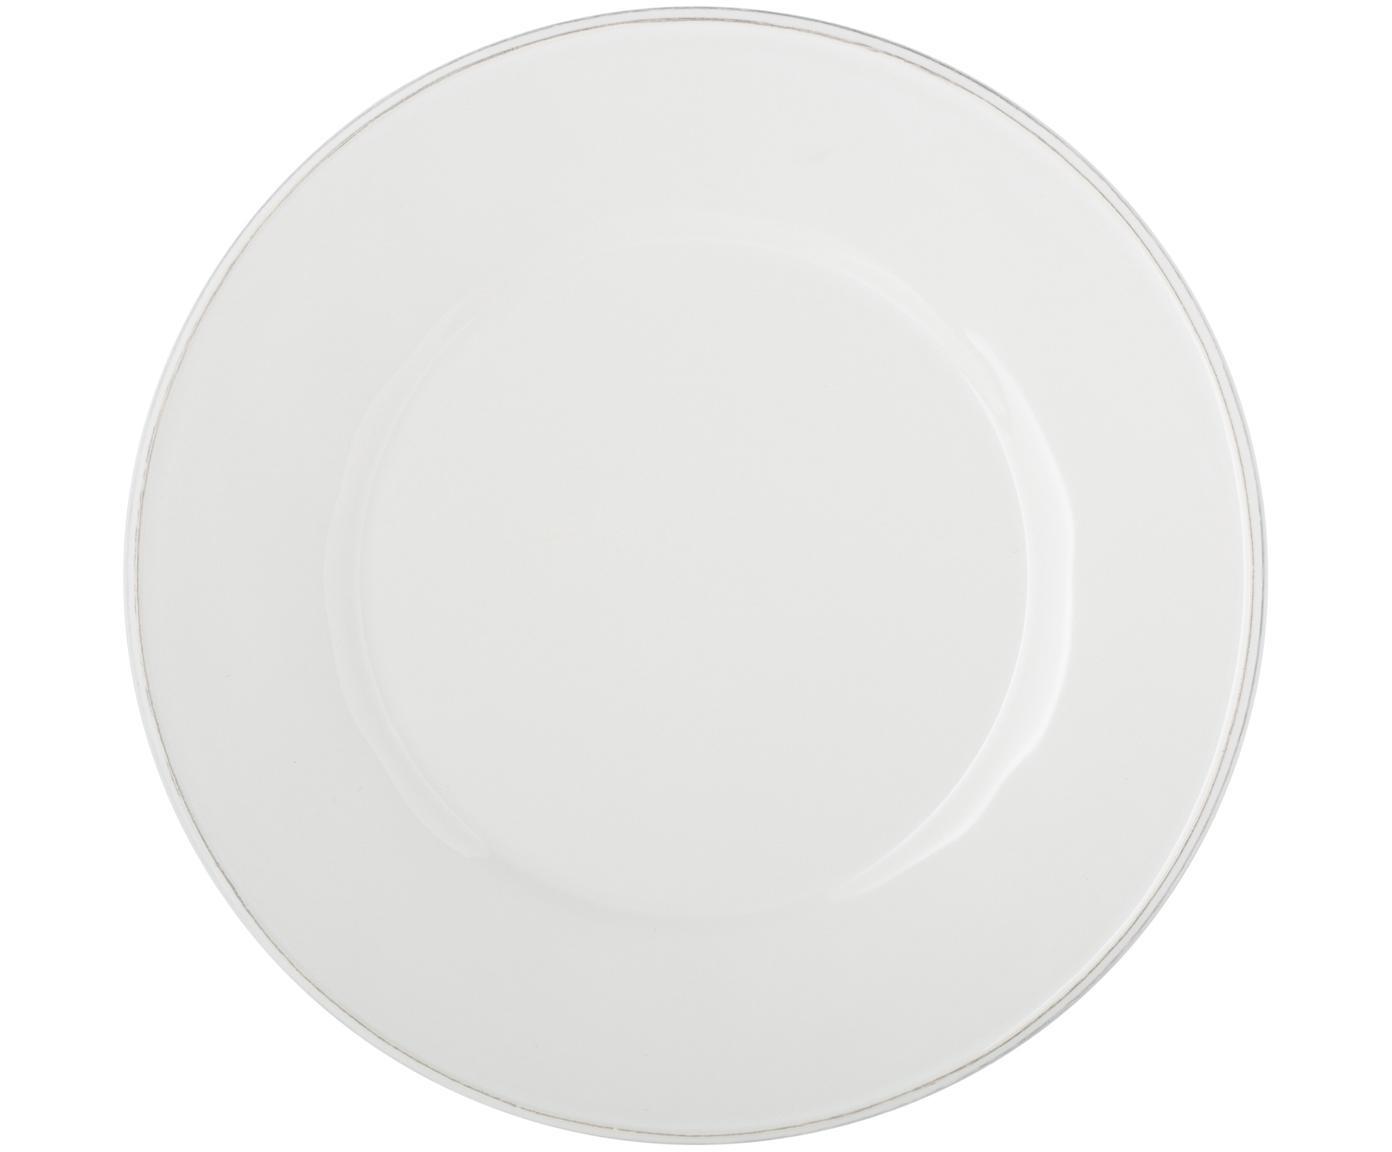 Piatto piano in bianco Constance 2 pz, Ceramica, Bianco, Ø 29 cm